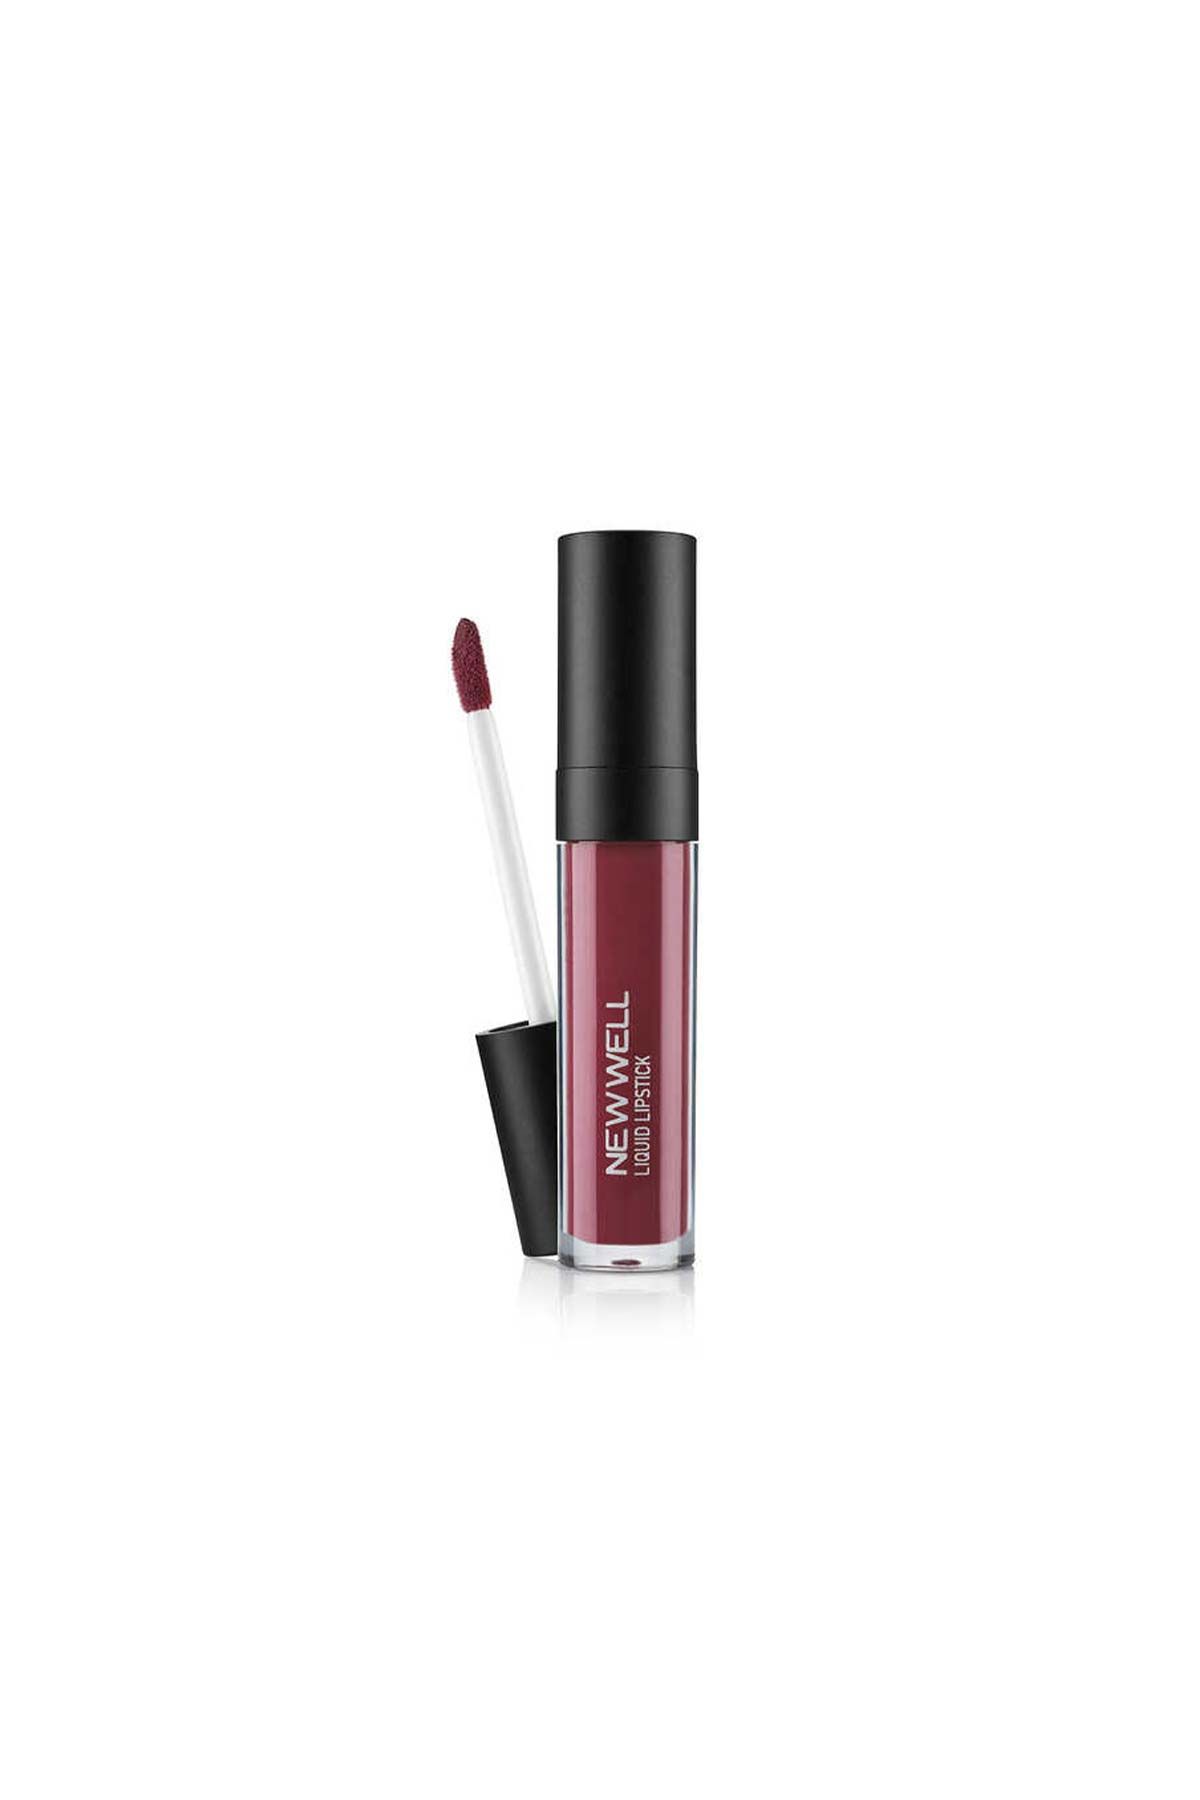 Liquid Lipgloss - 207 -Ruj - Lipstick